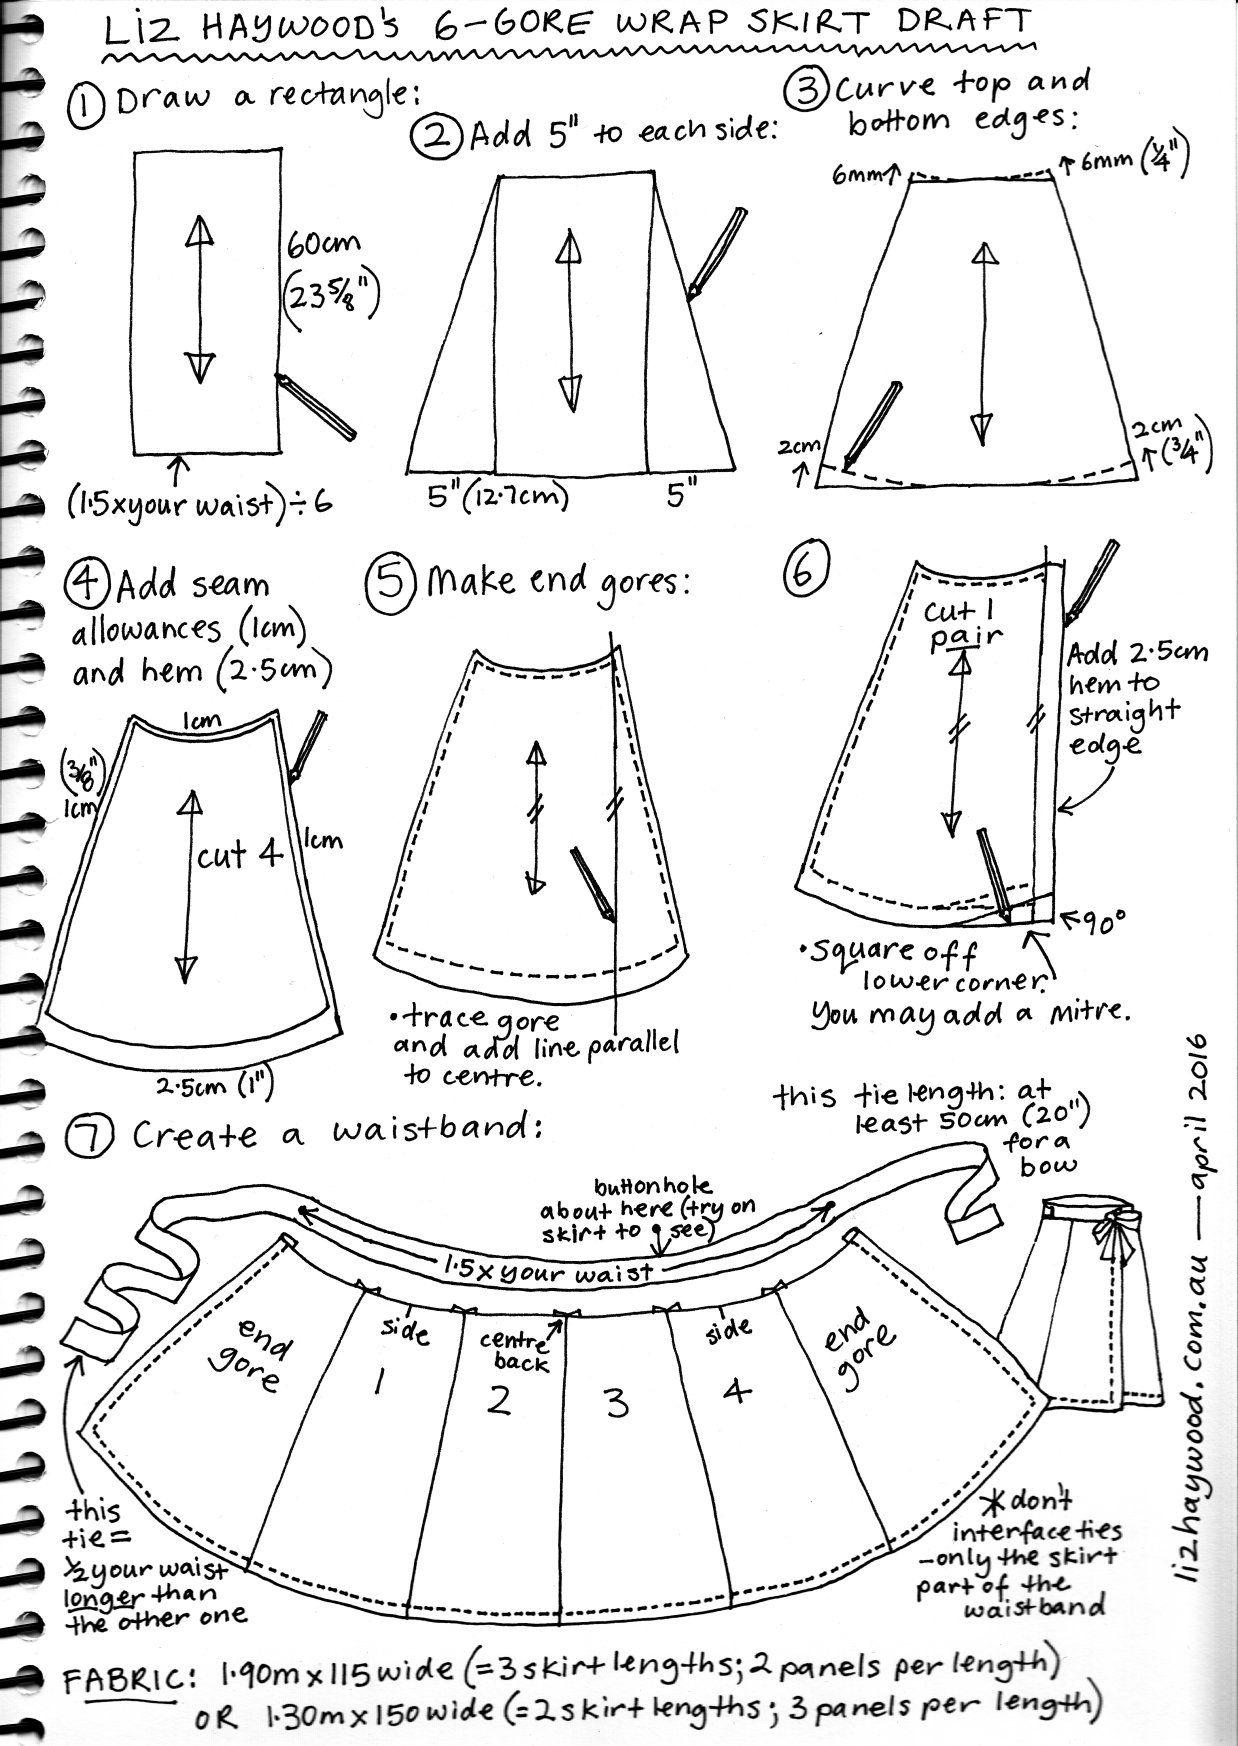 Free wrap skirt pattern summary | Mode/apron | Pinterest | Costura ...